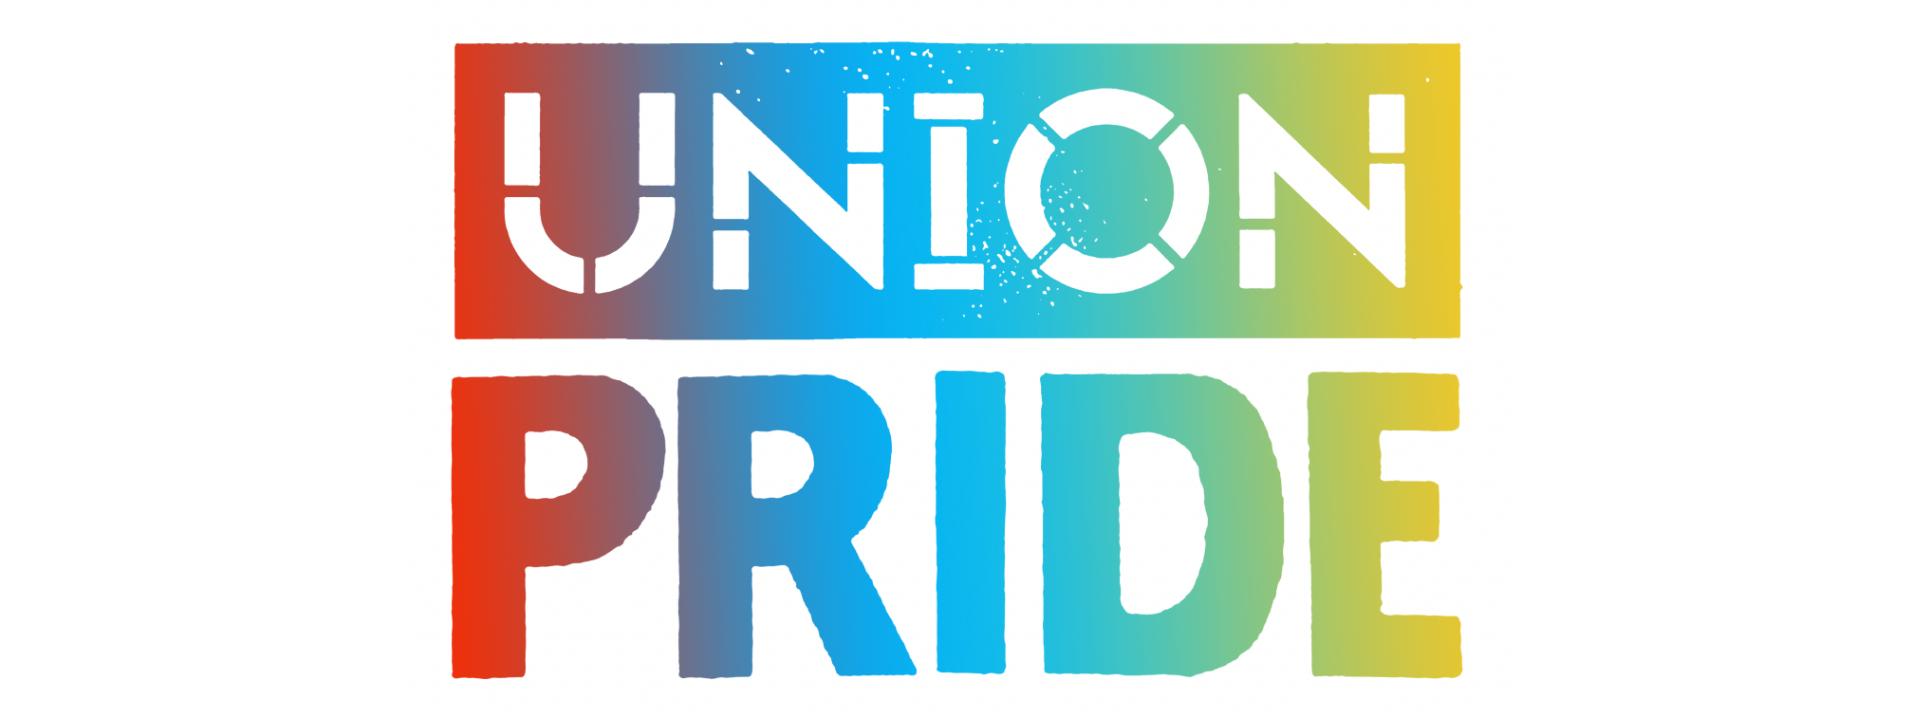 Union Pride Logo in rainbow colors banner